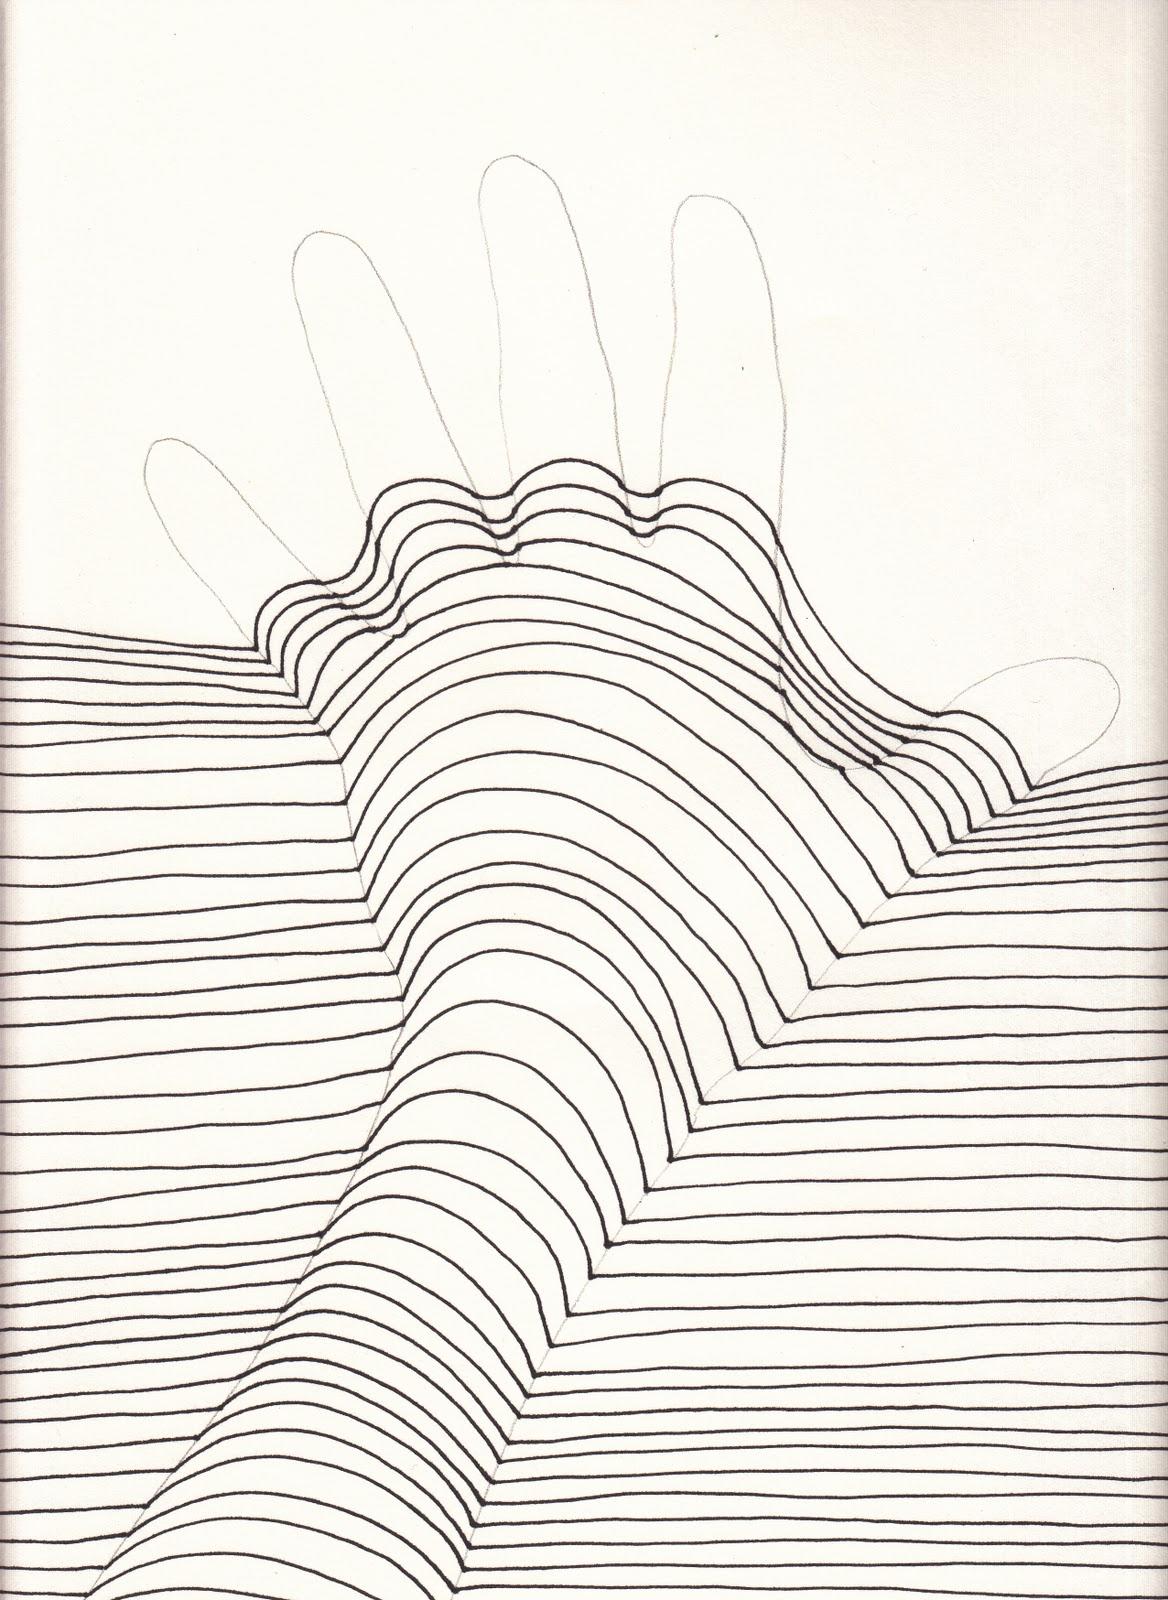 Straight Line Intro The Art Of Closing : The creative spirit op art hands that pop